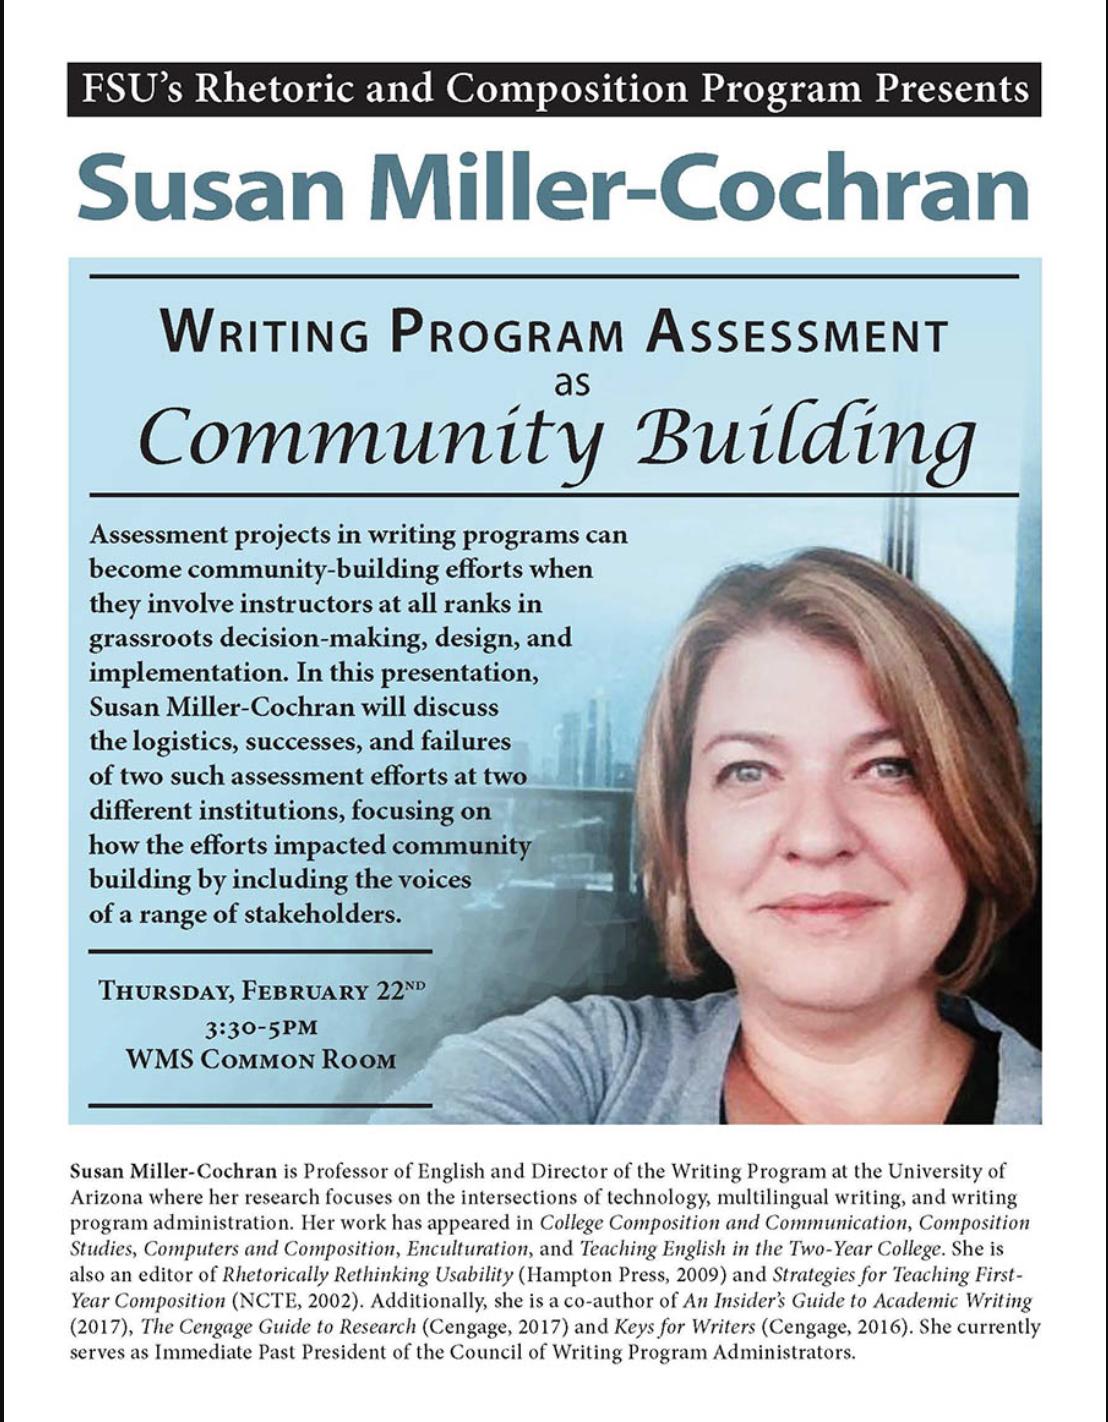 Susan Miller-Cochran